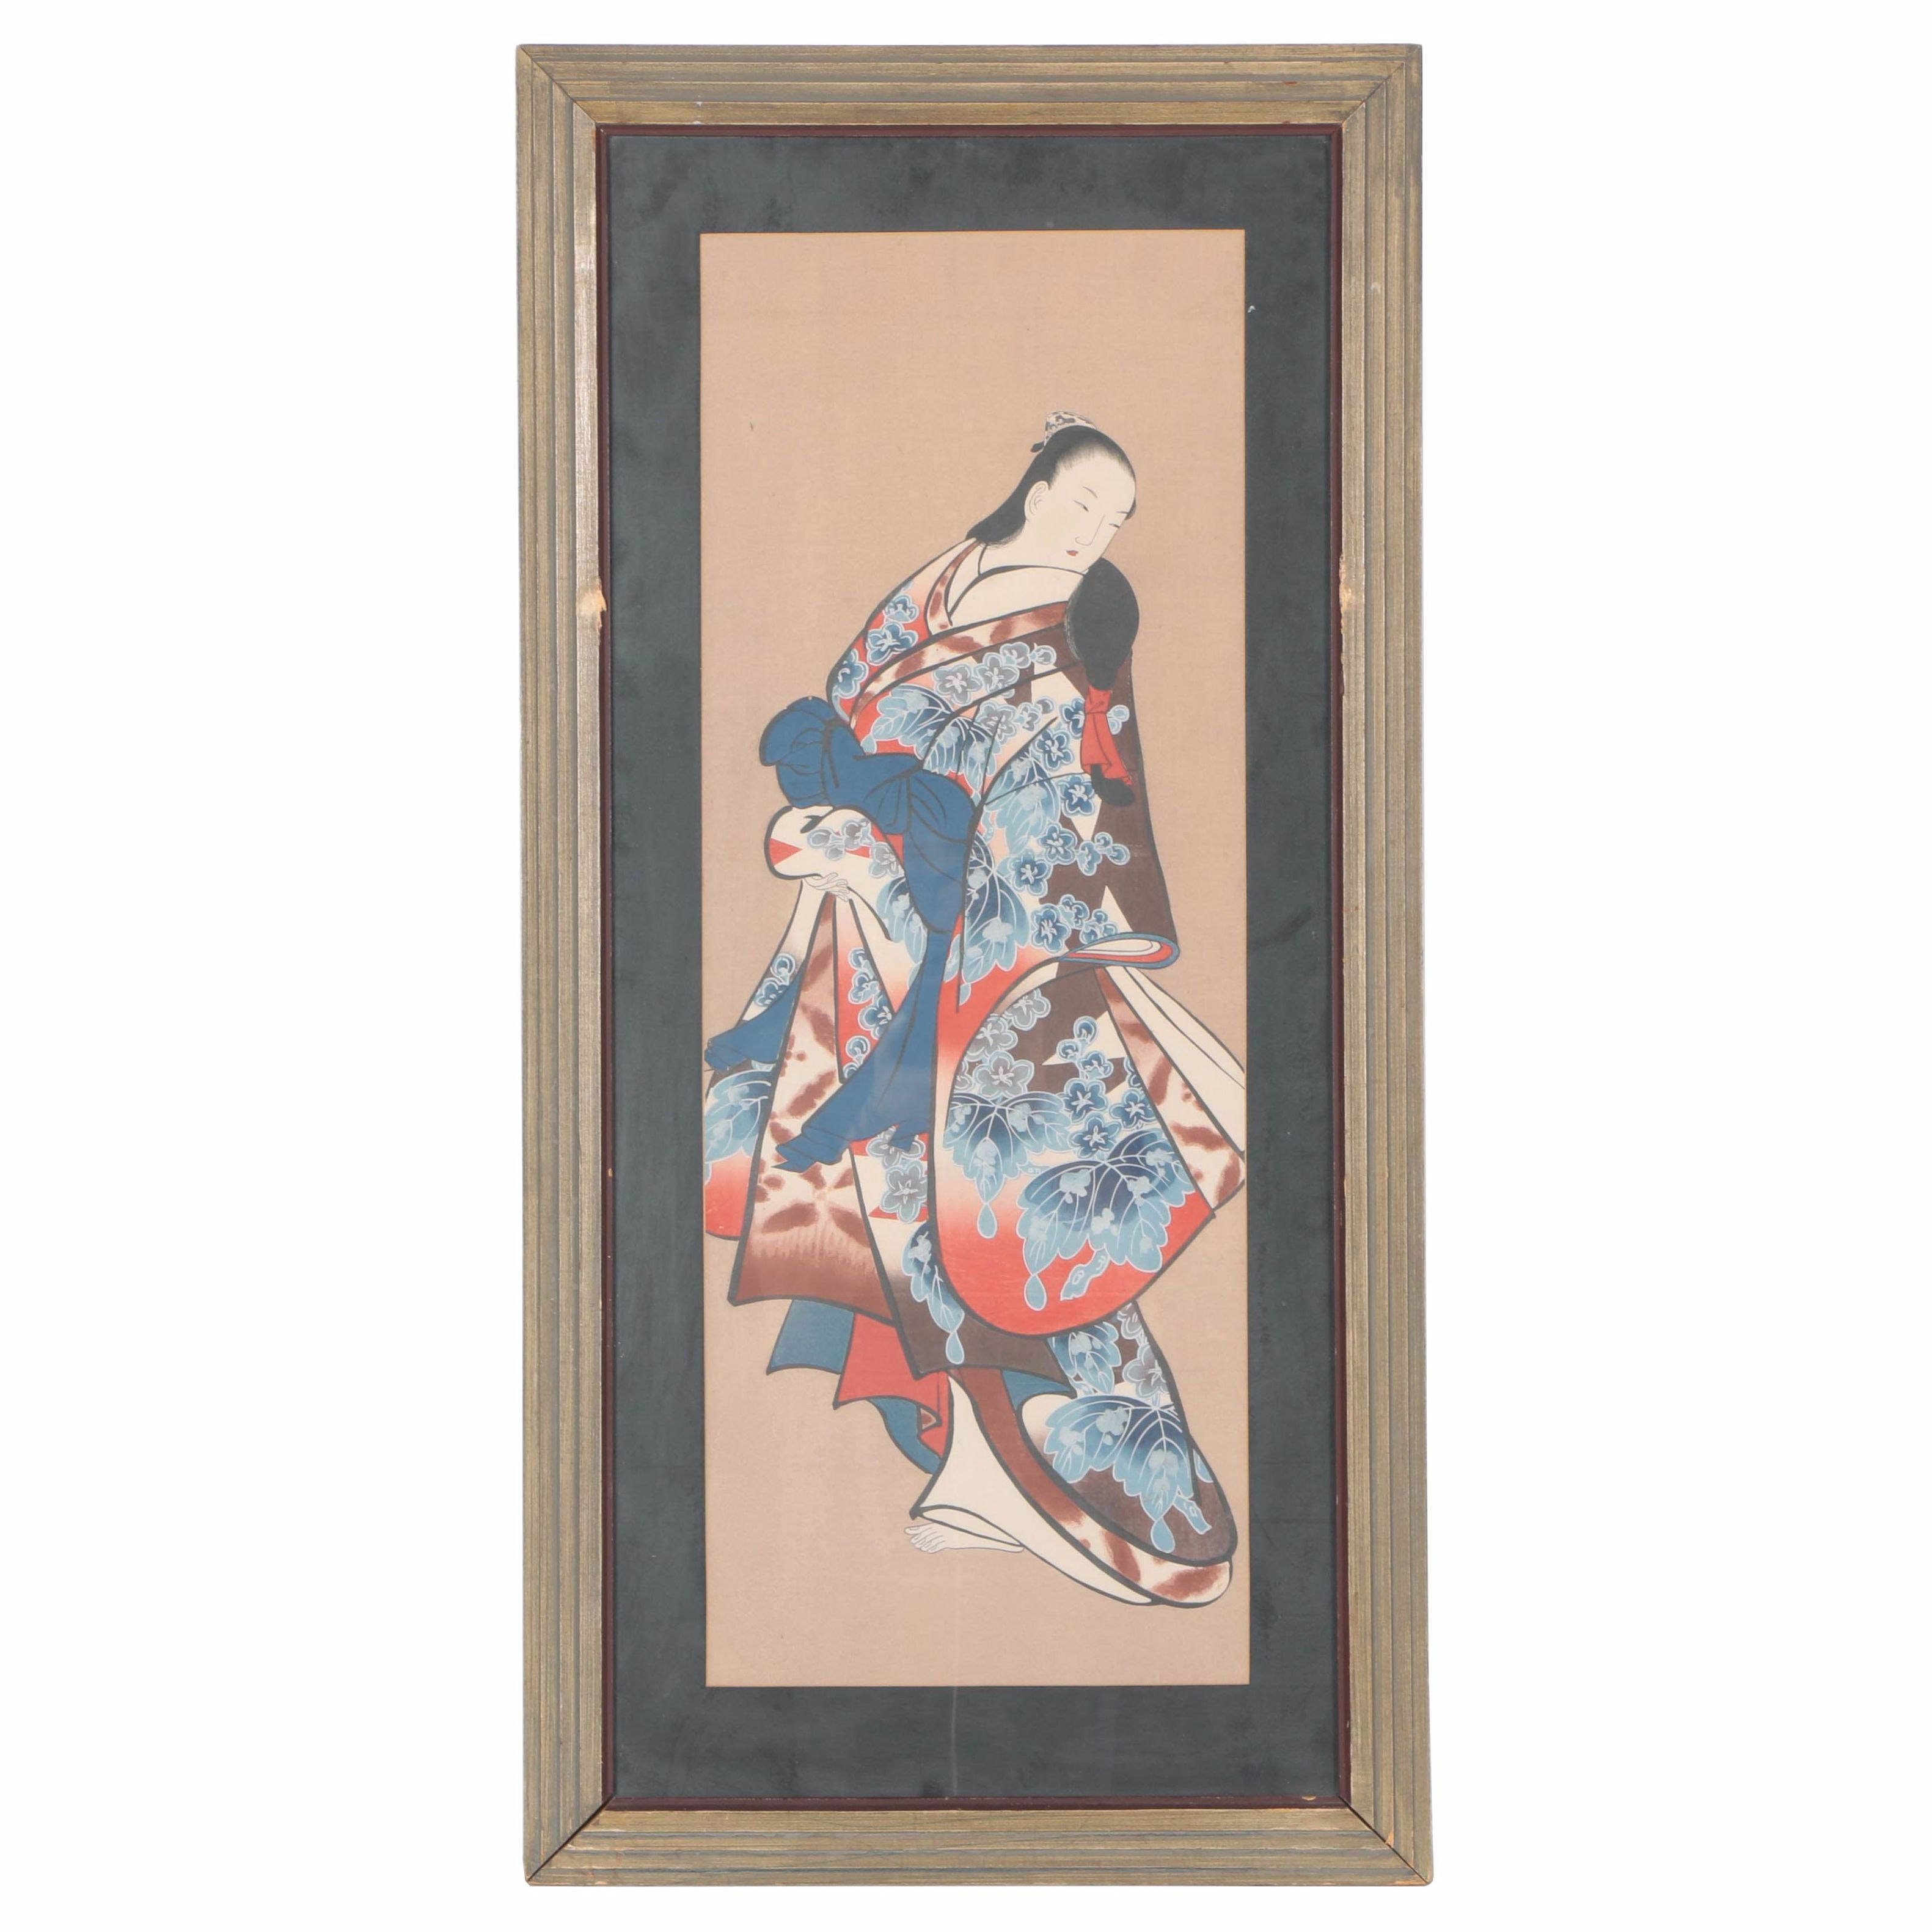 Framed Japanese Woodblock Print of an Elegant Woman